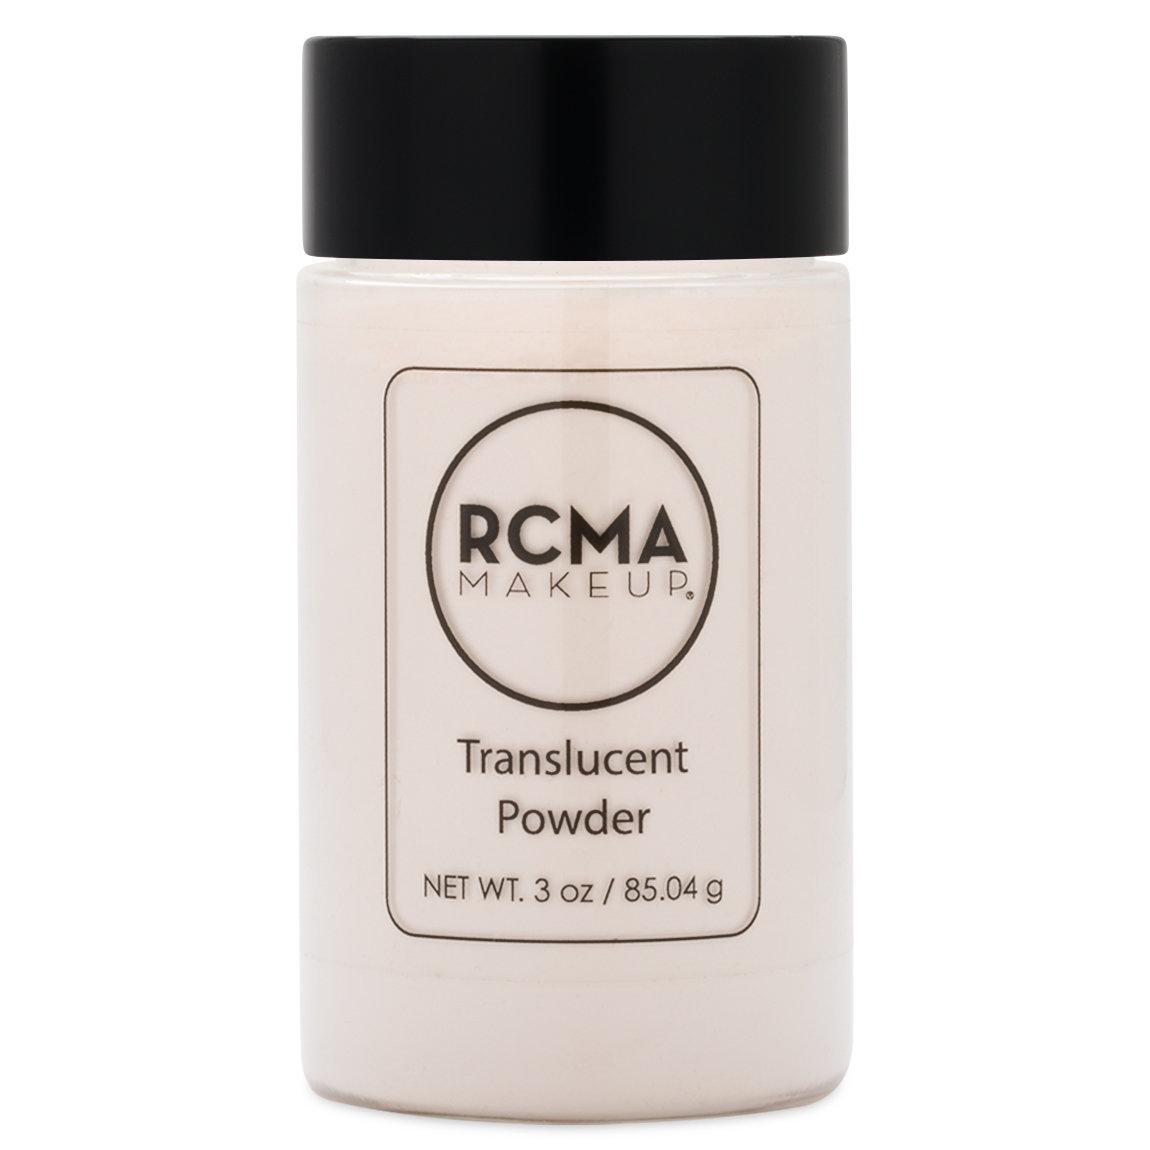 RCMA Makeup Translucent Powder 3 oz alternative view 1 - product swatch.